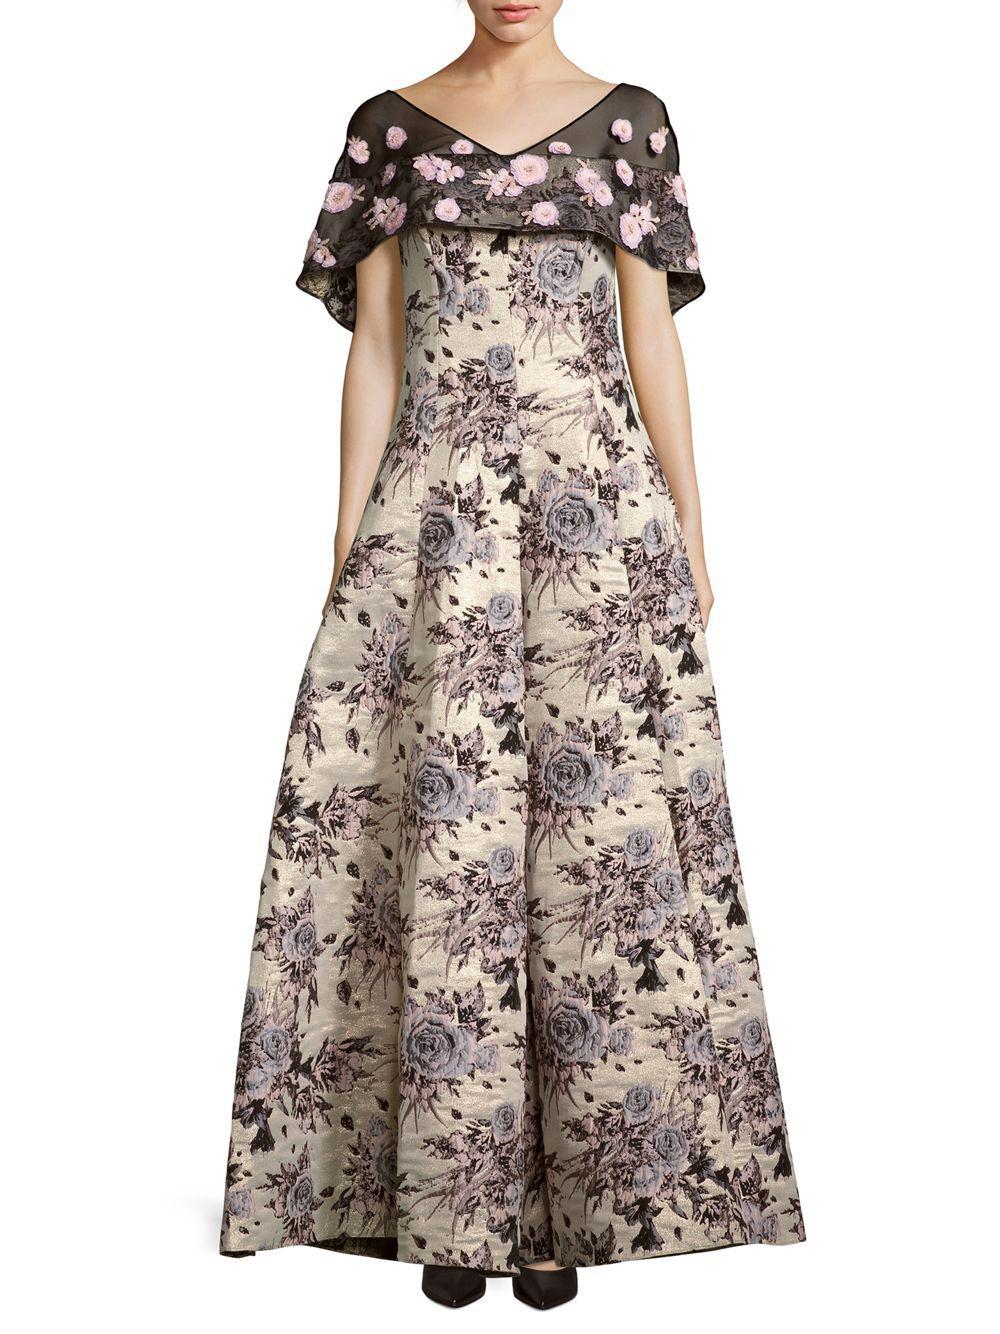 Lyst - Badgley Mischka Floral-motif Brocade Gown